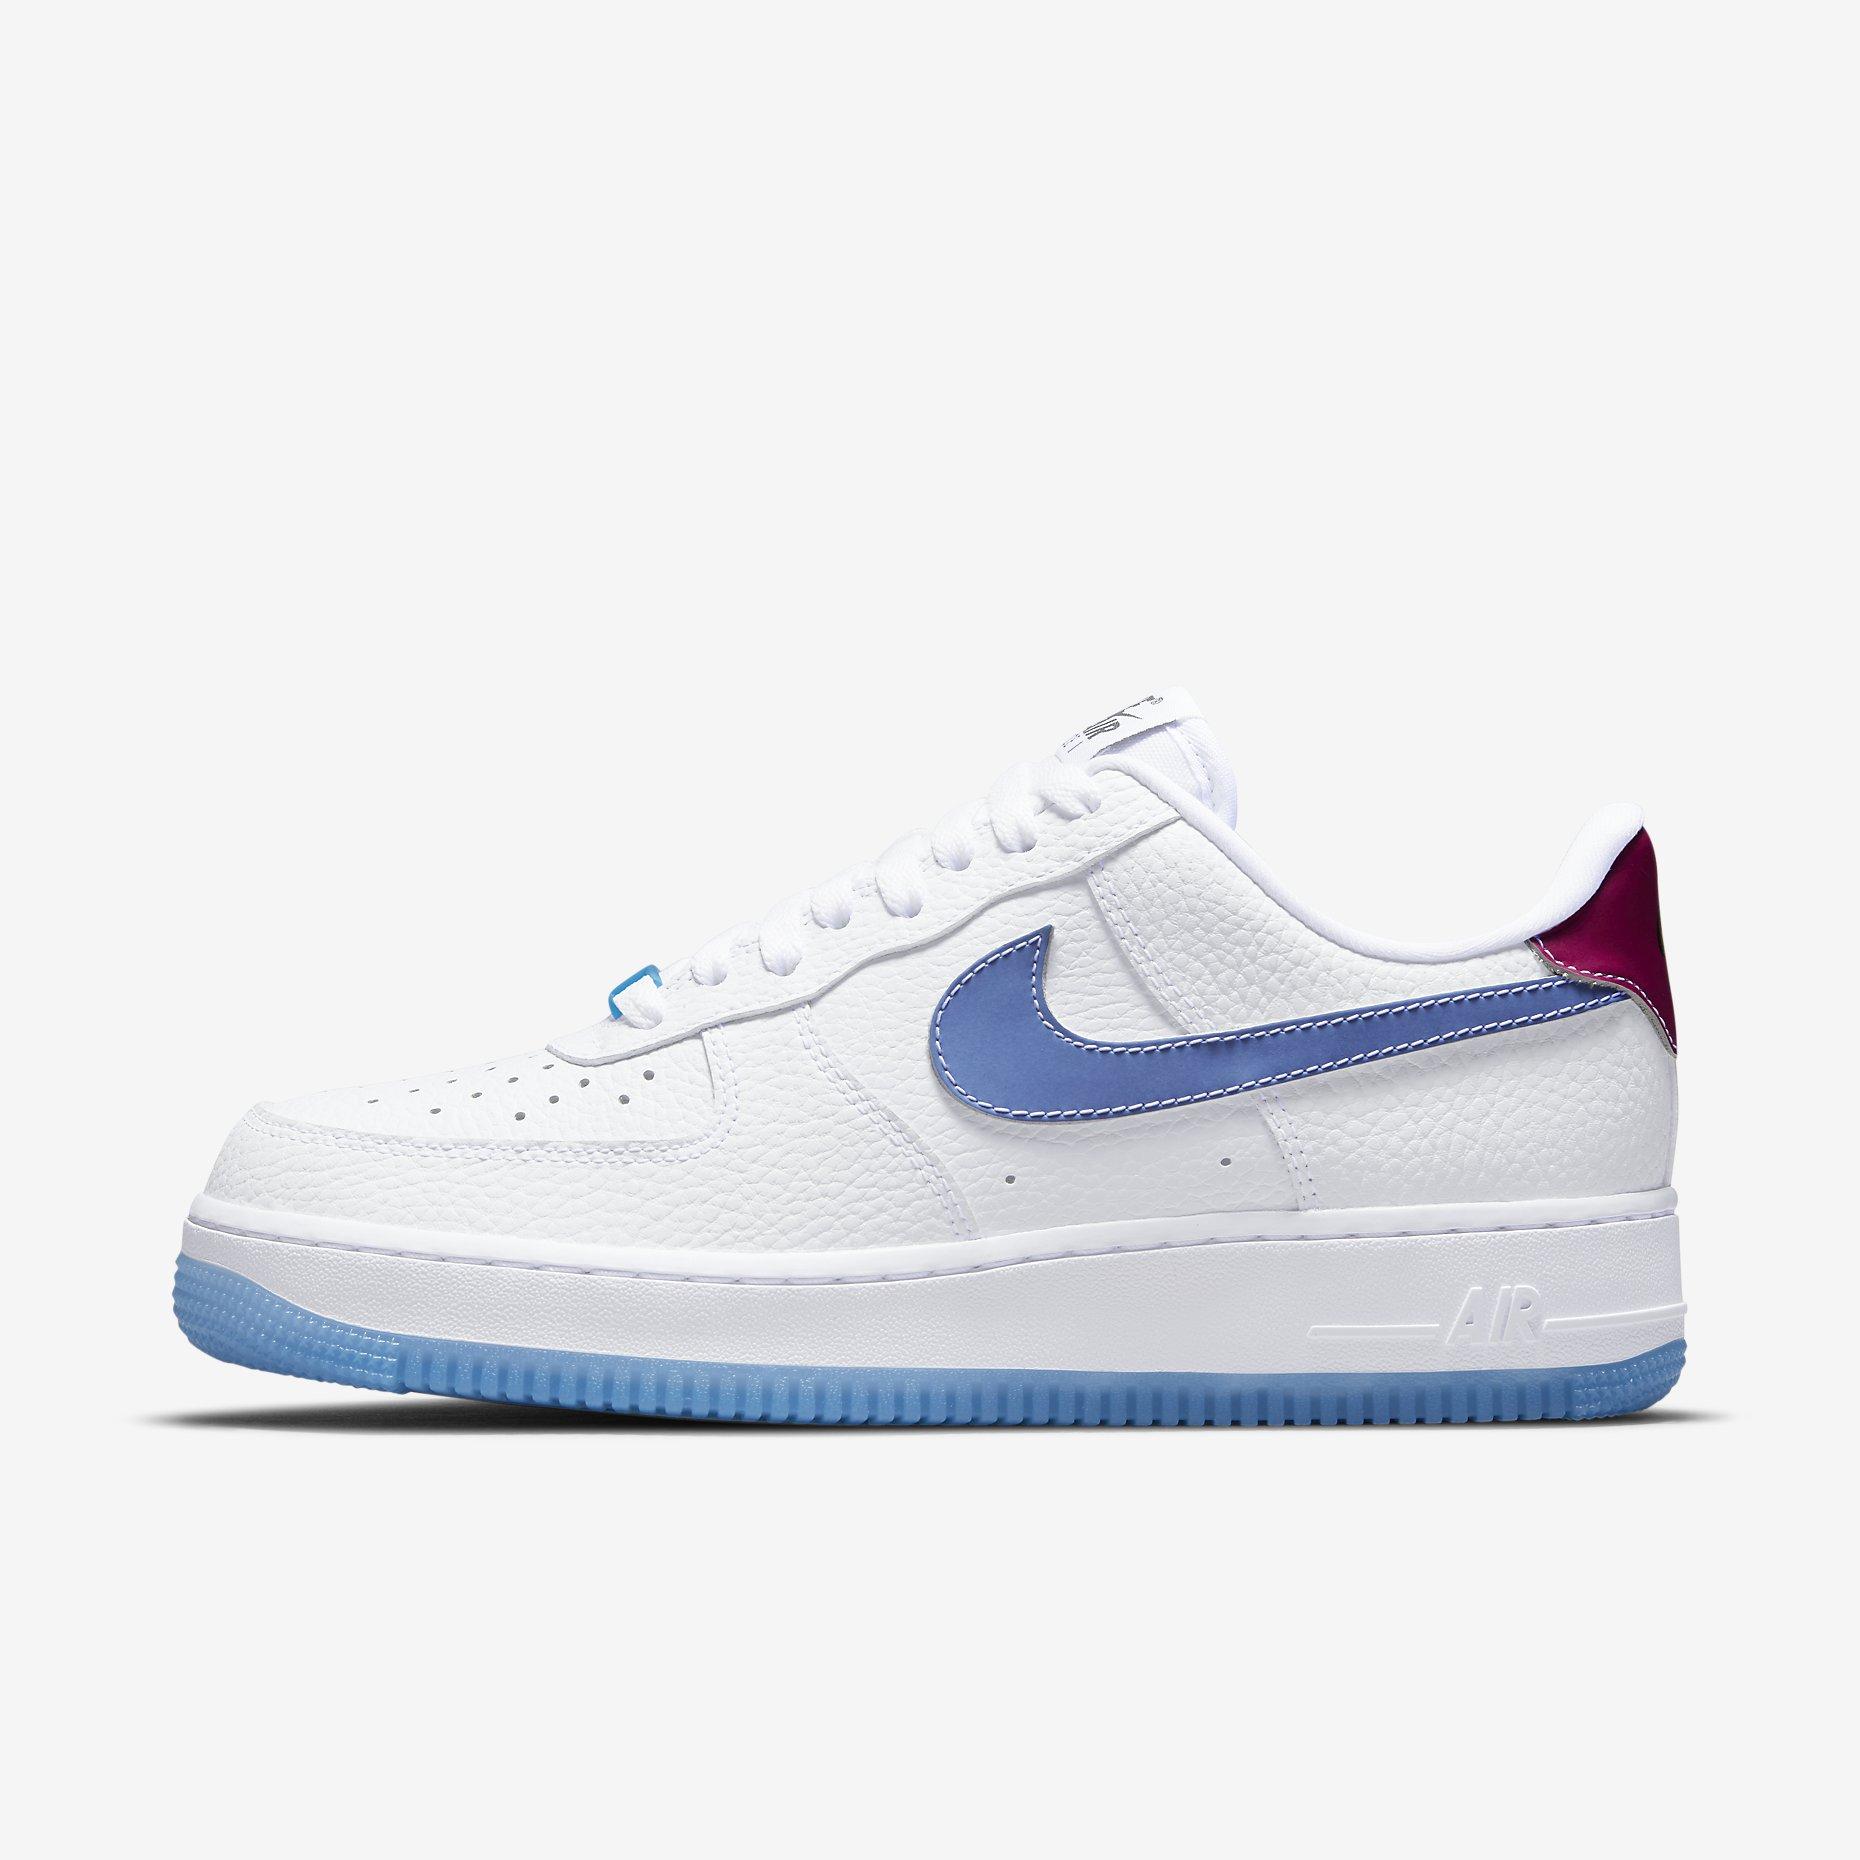 Women's Nike Air Force 1 '07 LX 'UV Reactive Swoosh'